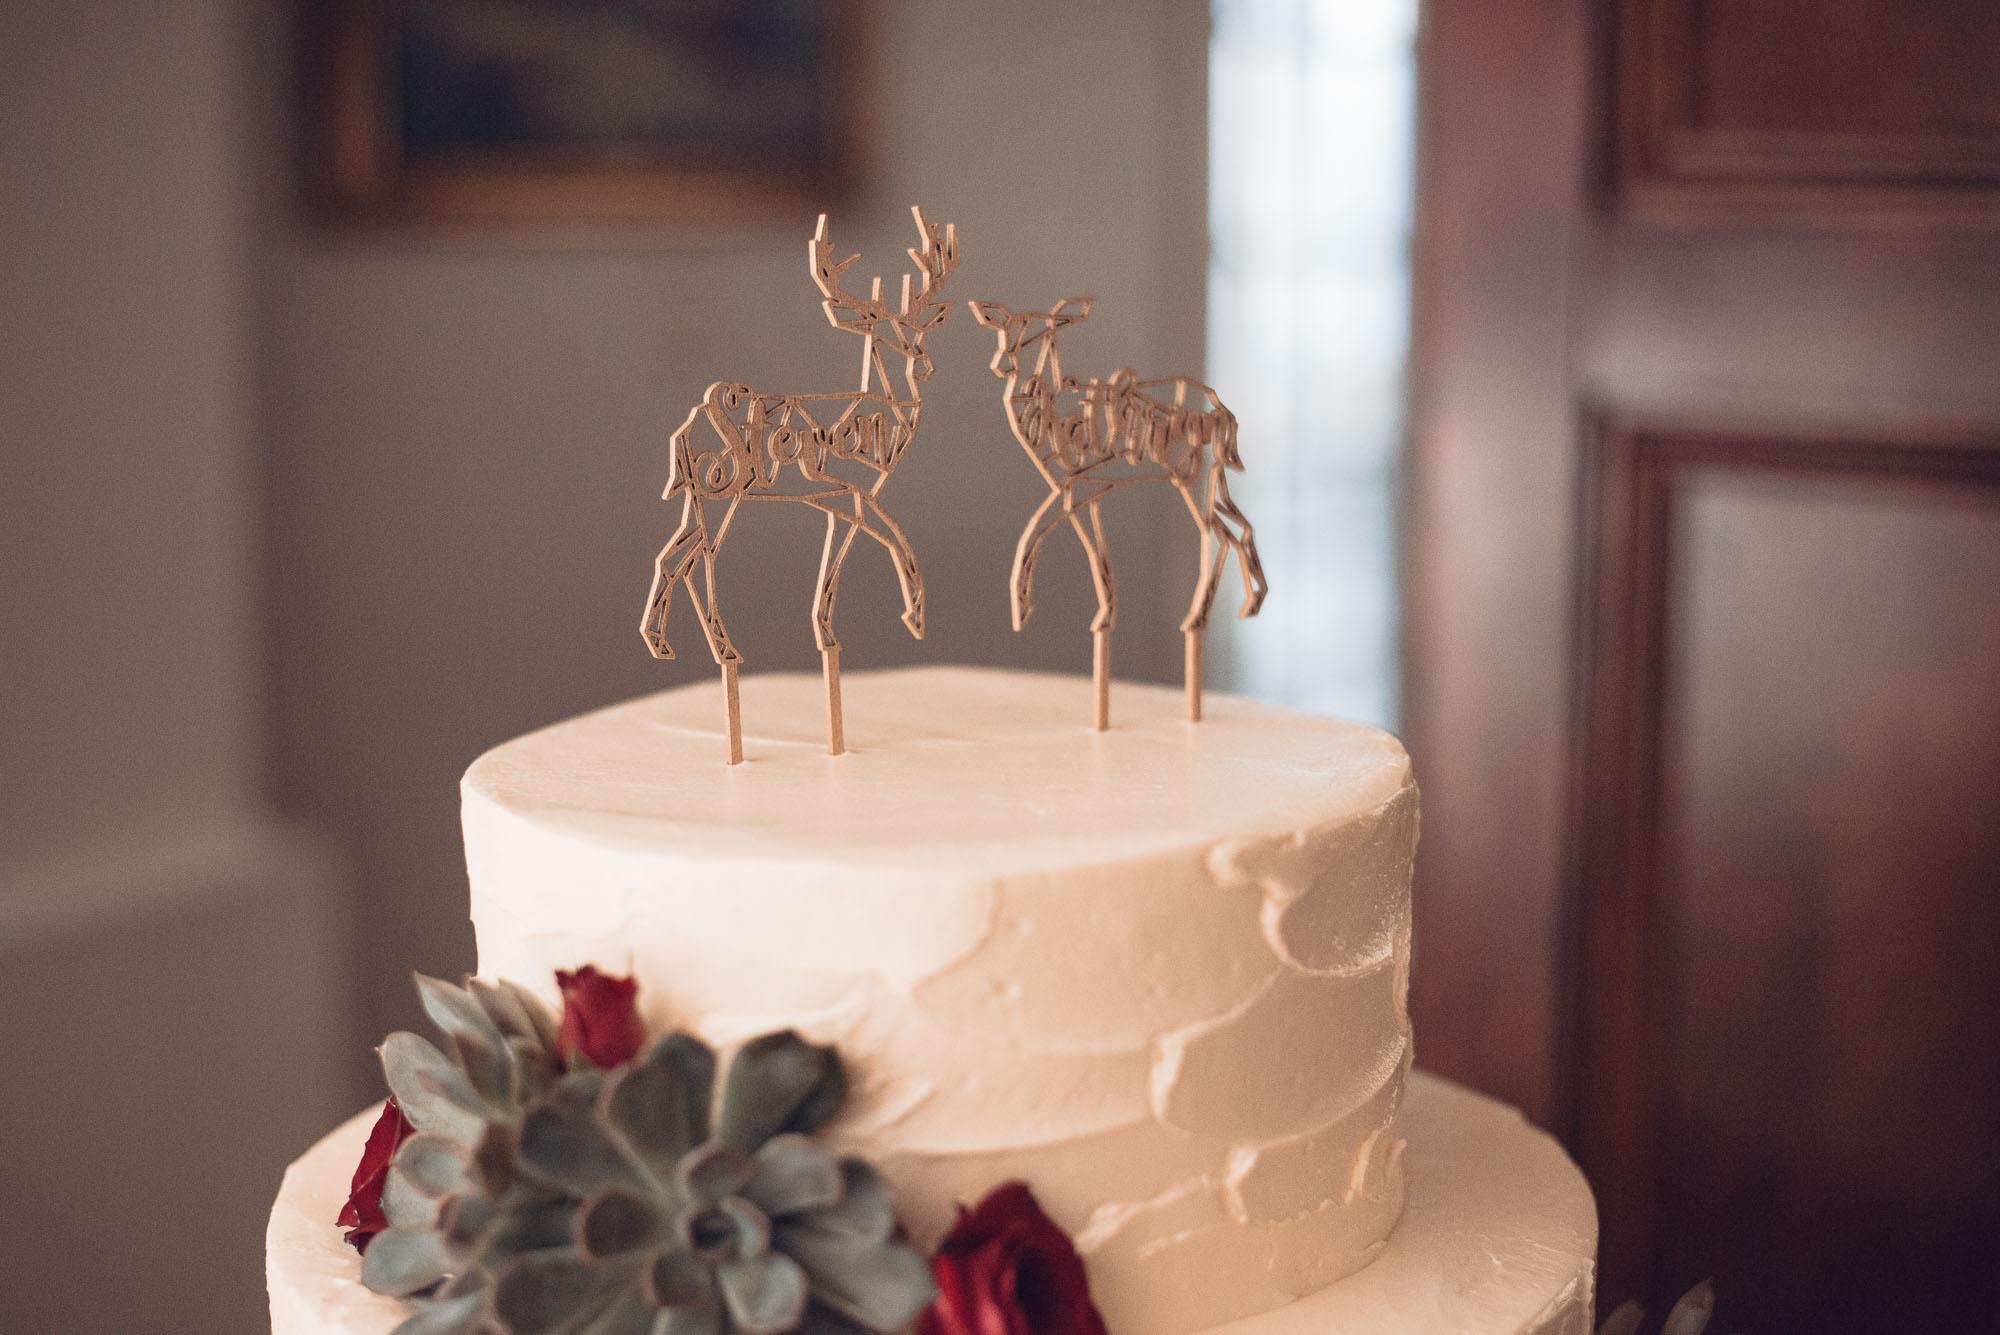 woodwinds_wedding_171020_web-27.jpg